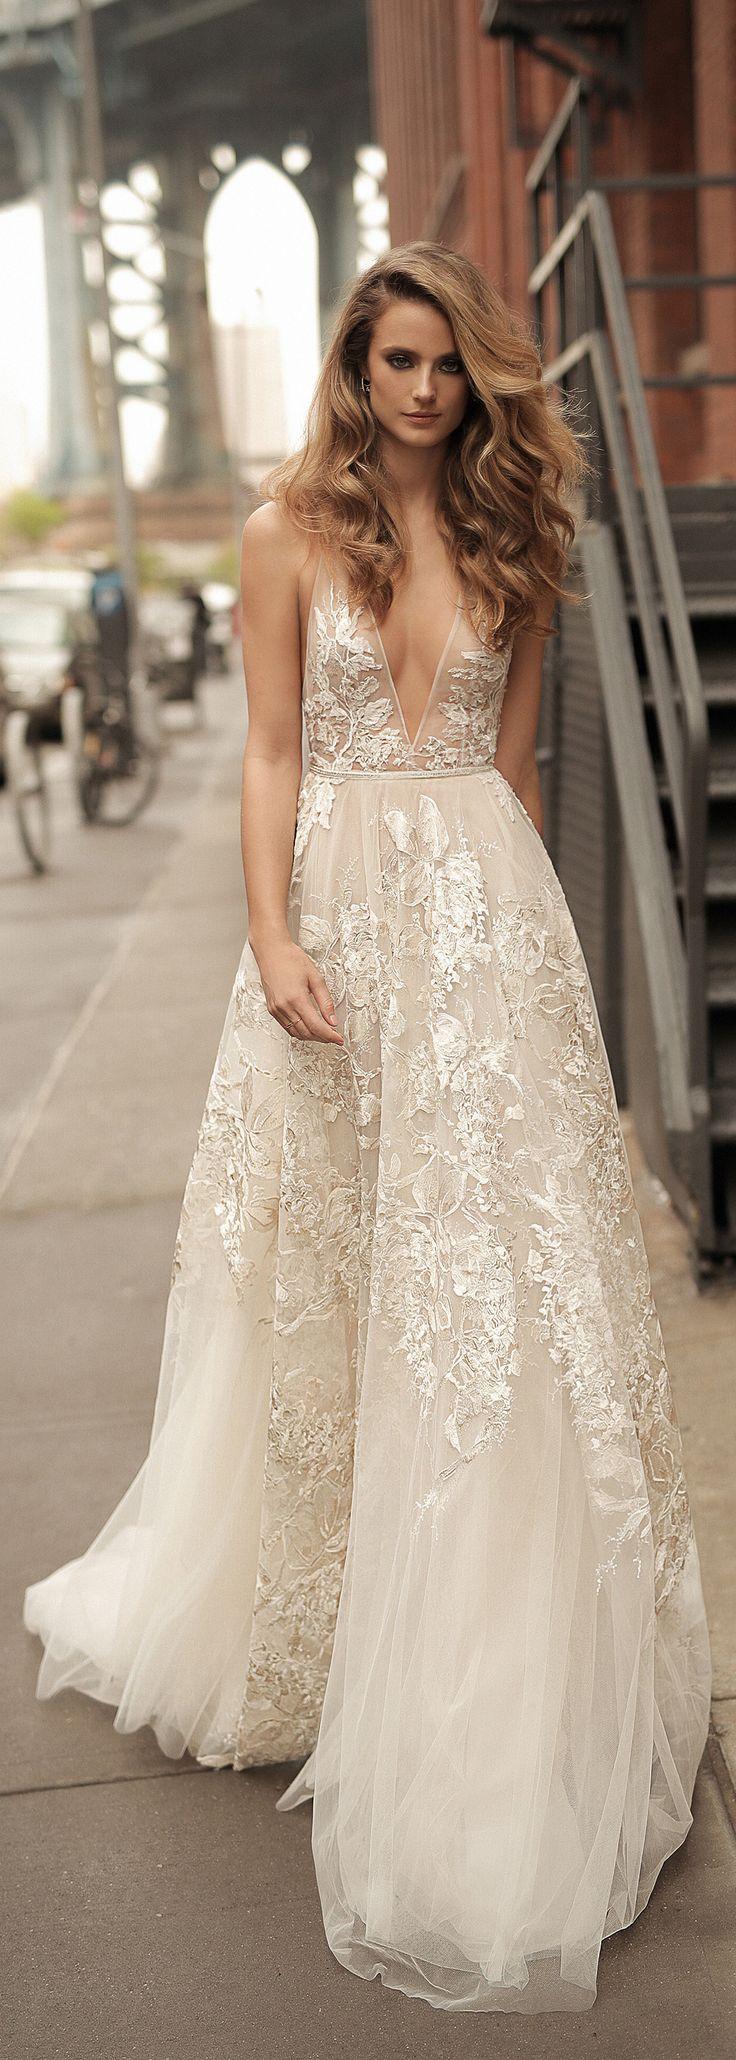 Wedding dresses for athletic figures   best Weddings images on Pinterest